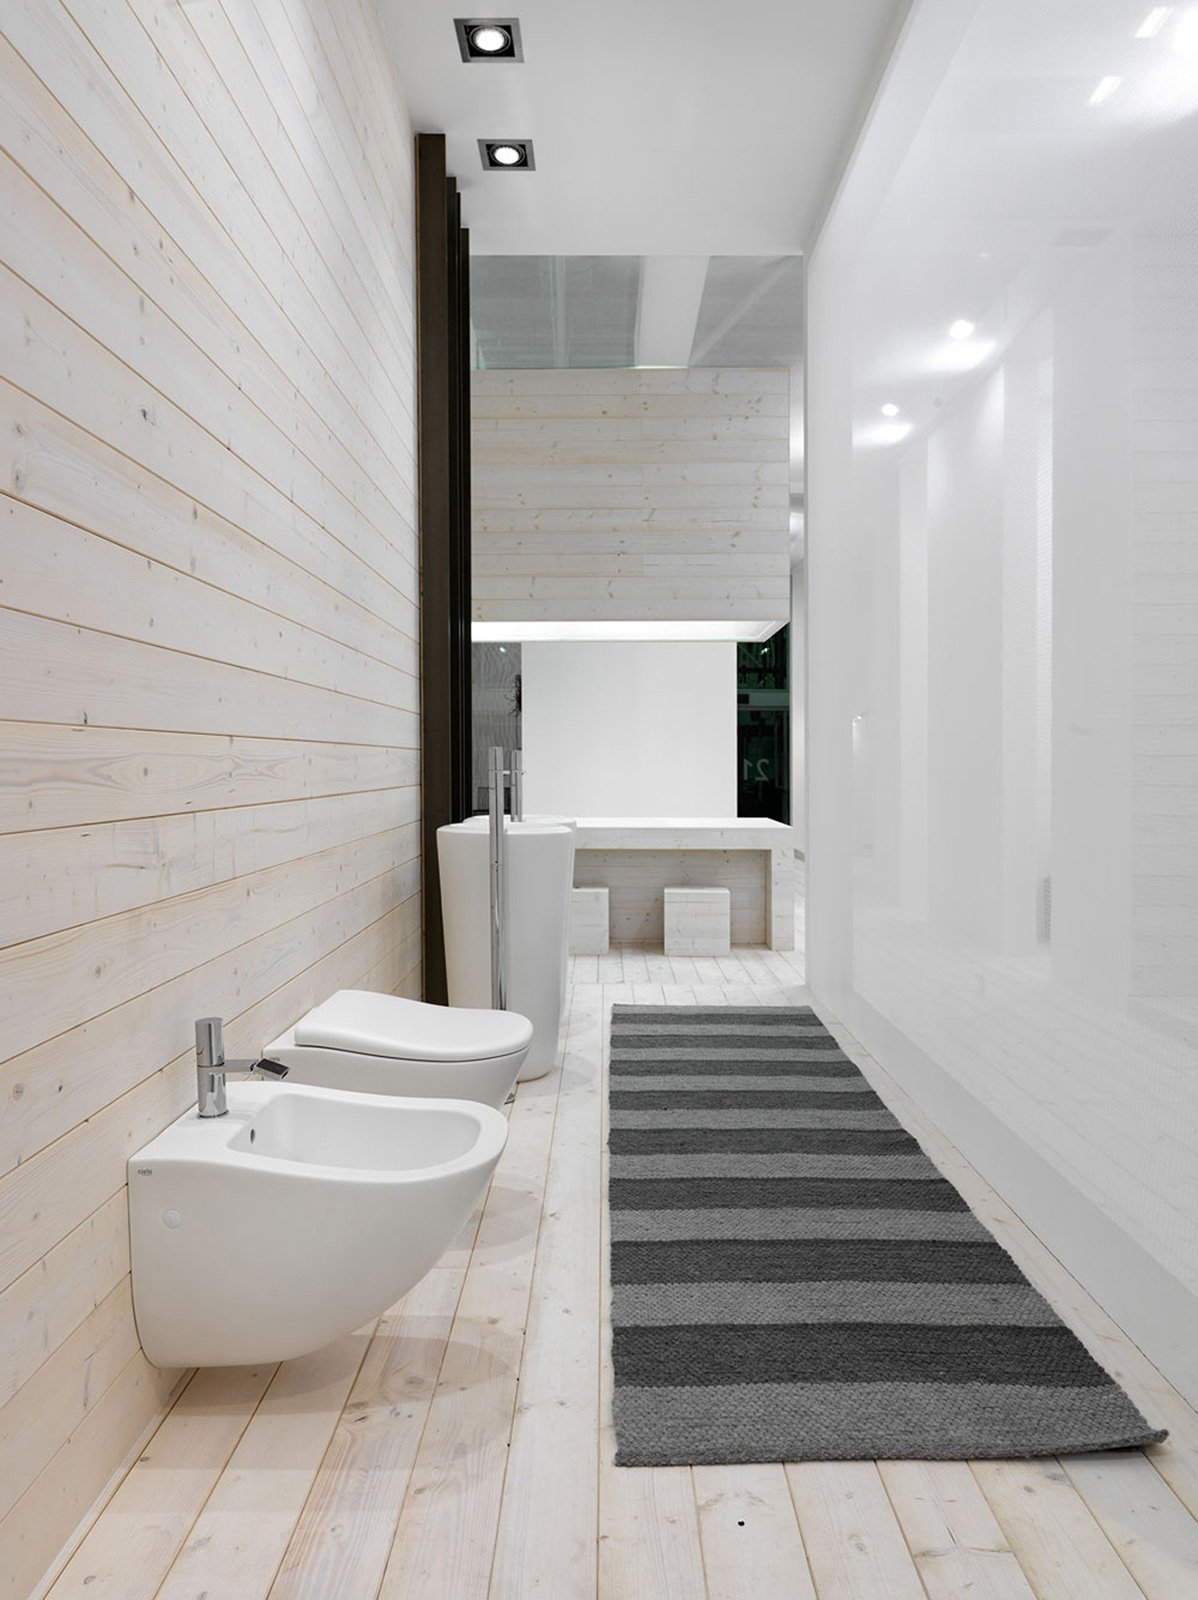 Muretto Per Sanitari Sospesi sanitari sospesi per bagno contemporaneo, foto wc e bidet